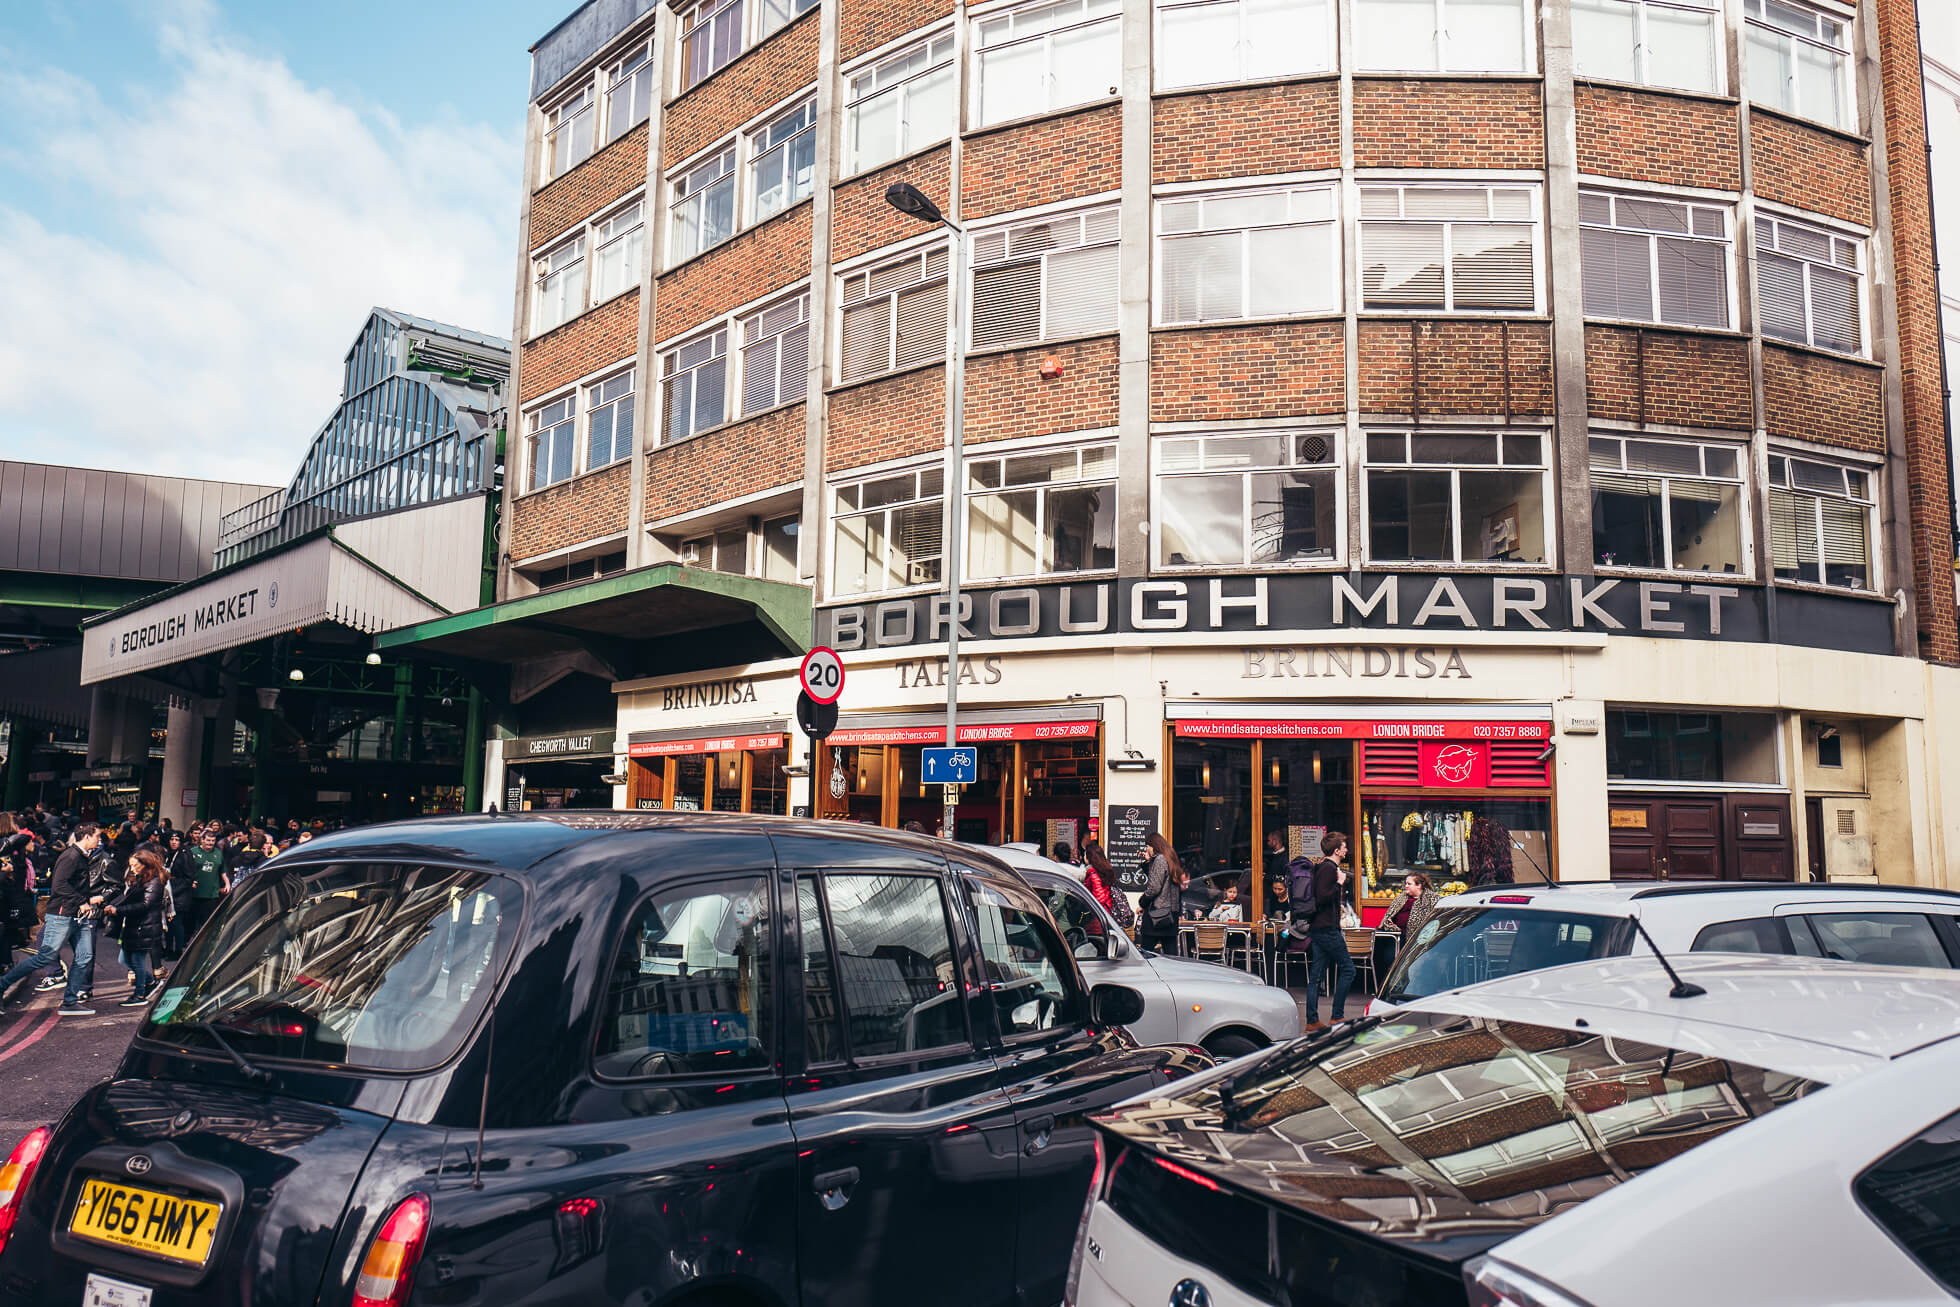 janni-deler-bourough-market-londonl1160272